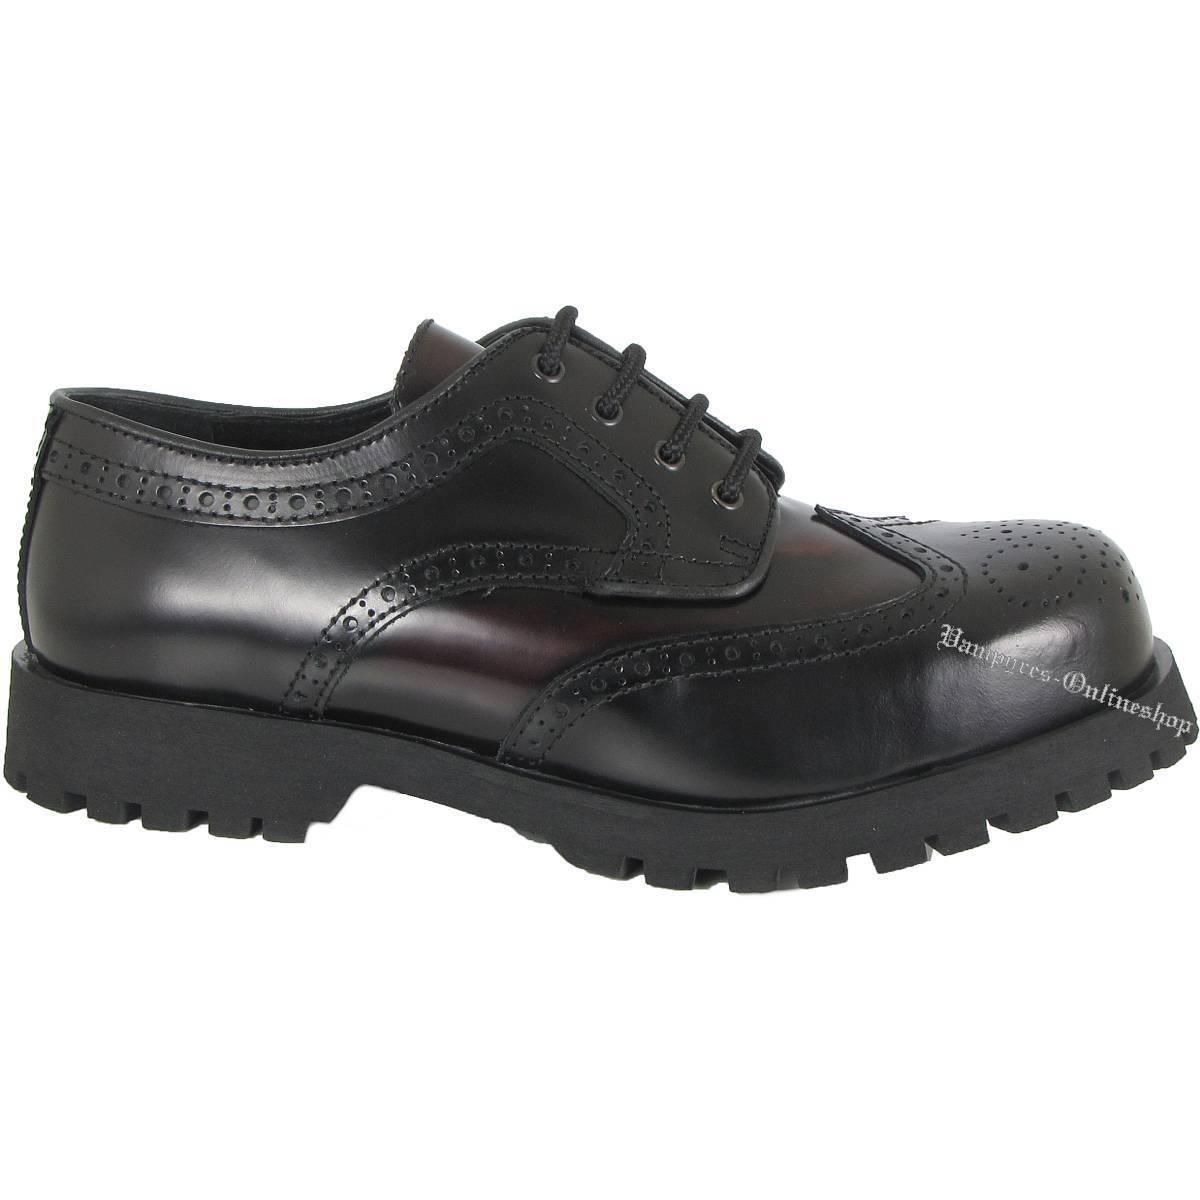 Boots & Braces Schuhe 4-Loch Budapester 2-Colour Schwarz Burgundy Burgundy Burgundy Rangers Leder 288108